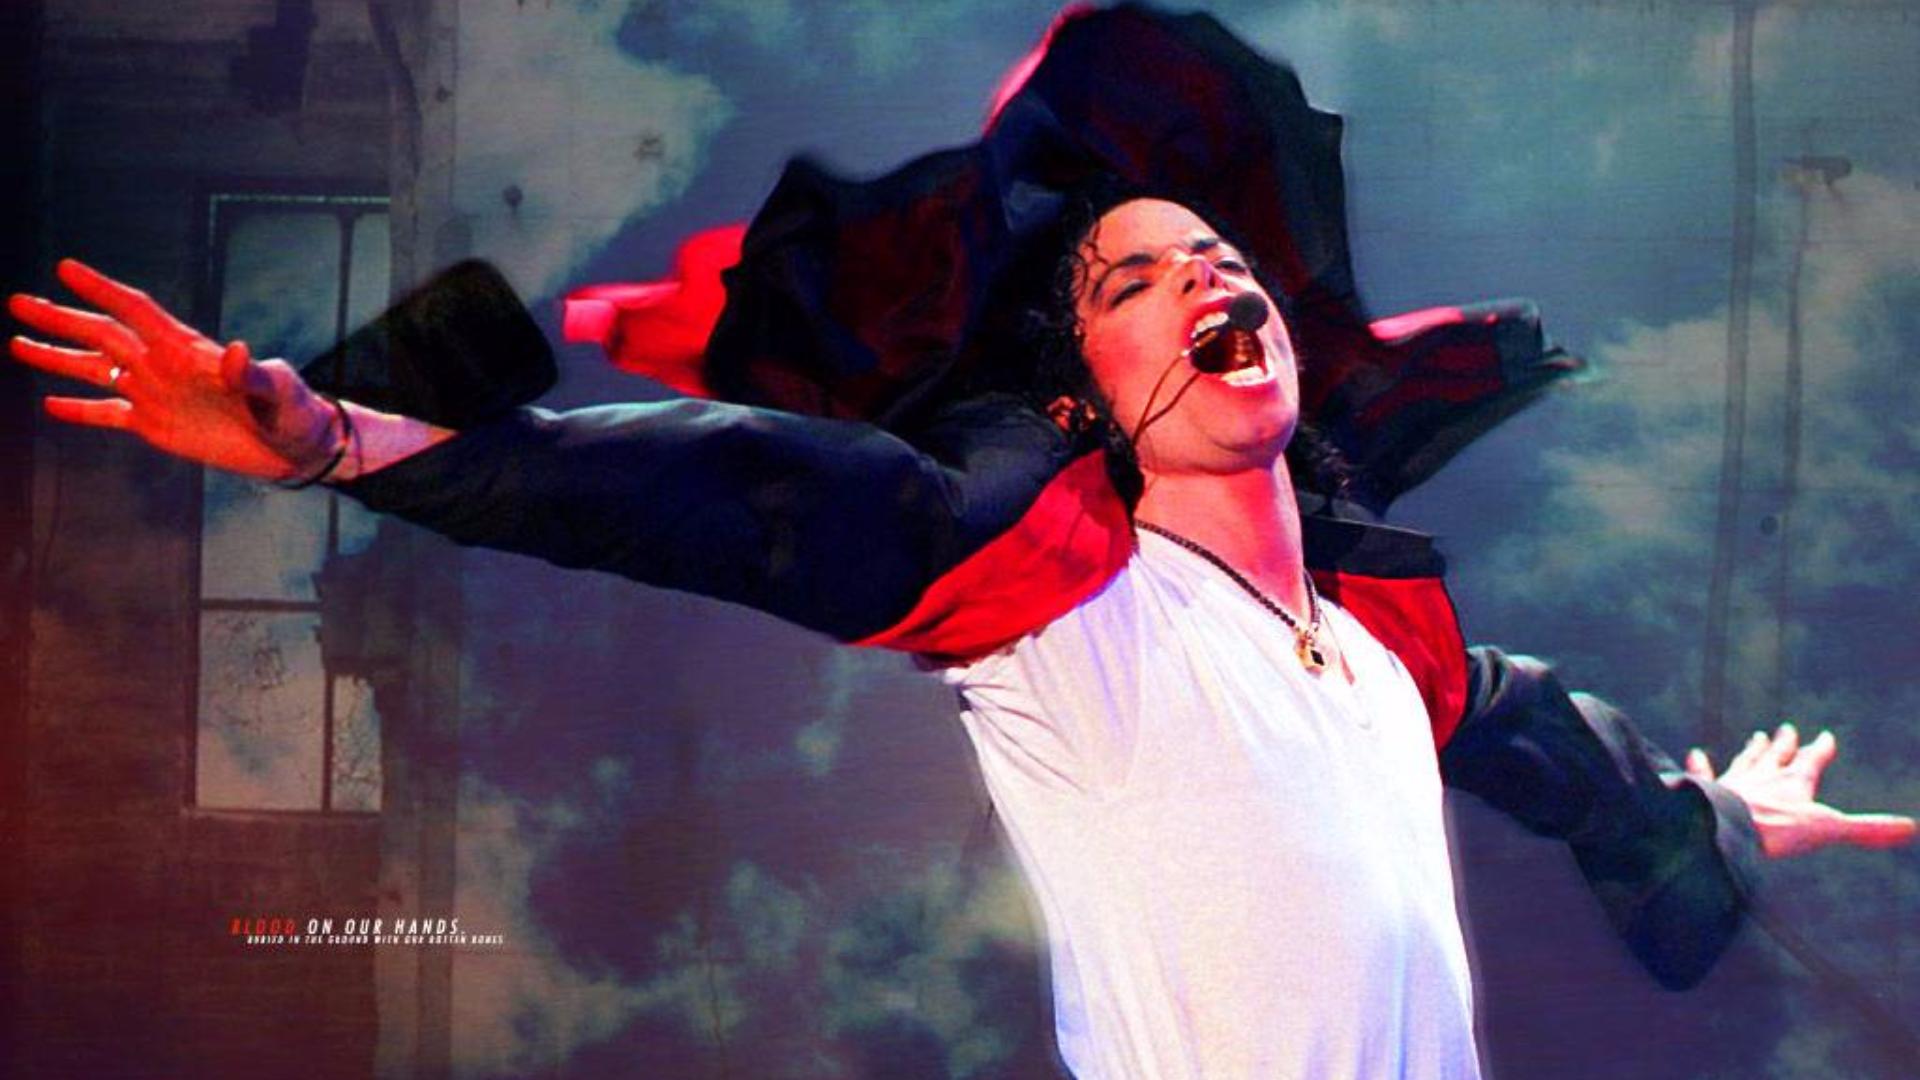 【蓝光重制】迈克尔杰克逊《地球之歌2019版》Michael Jackson Earth Song